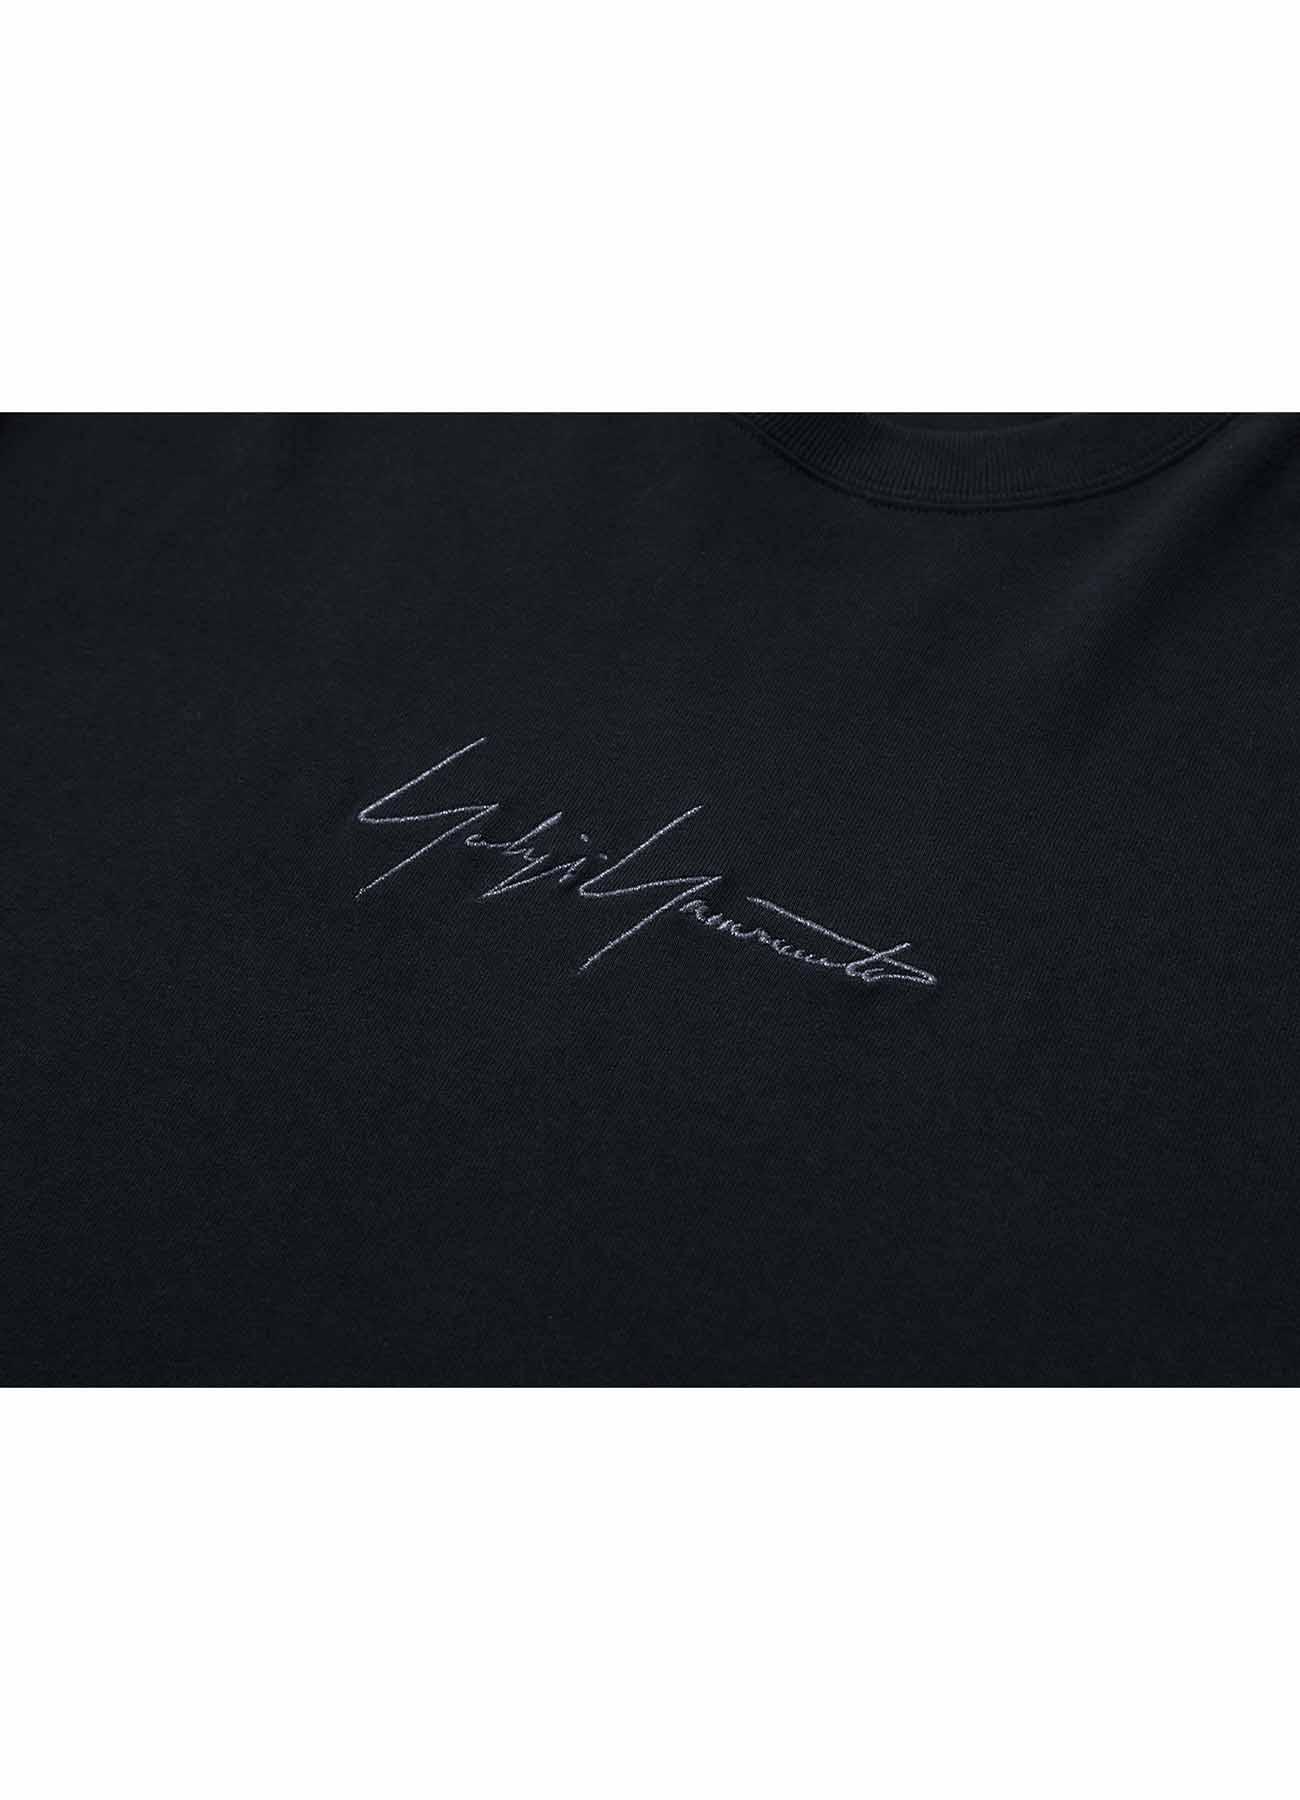 Yohji Yamamoto × New Era METALLIC BLACK SIGNATURE SS TEE